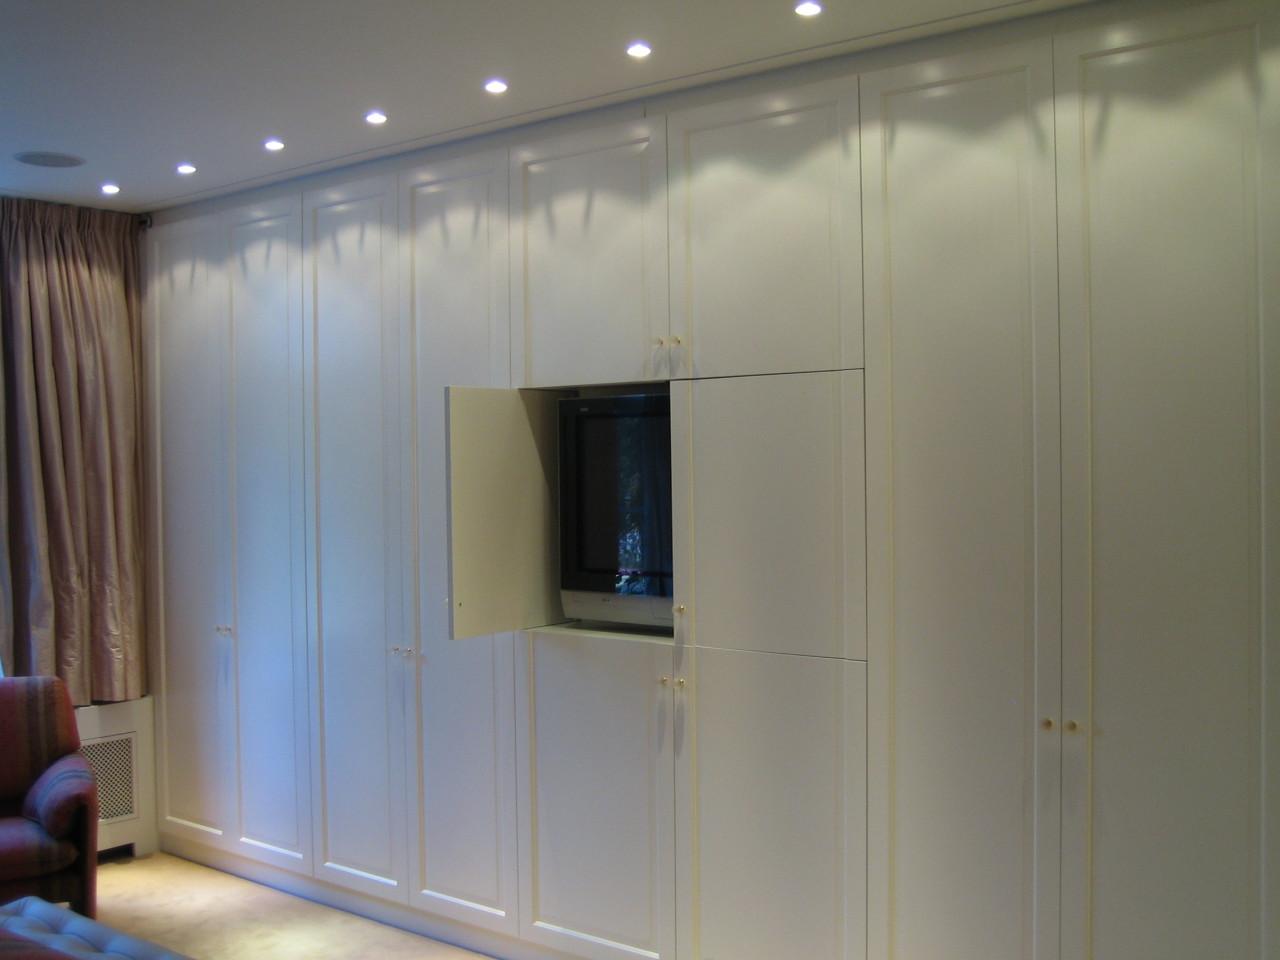 Slaapkamerkast - Dutch House Design